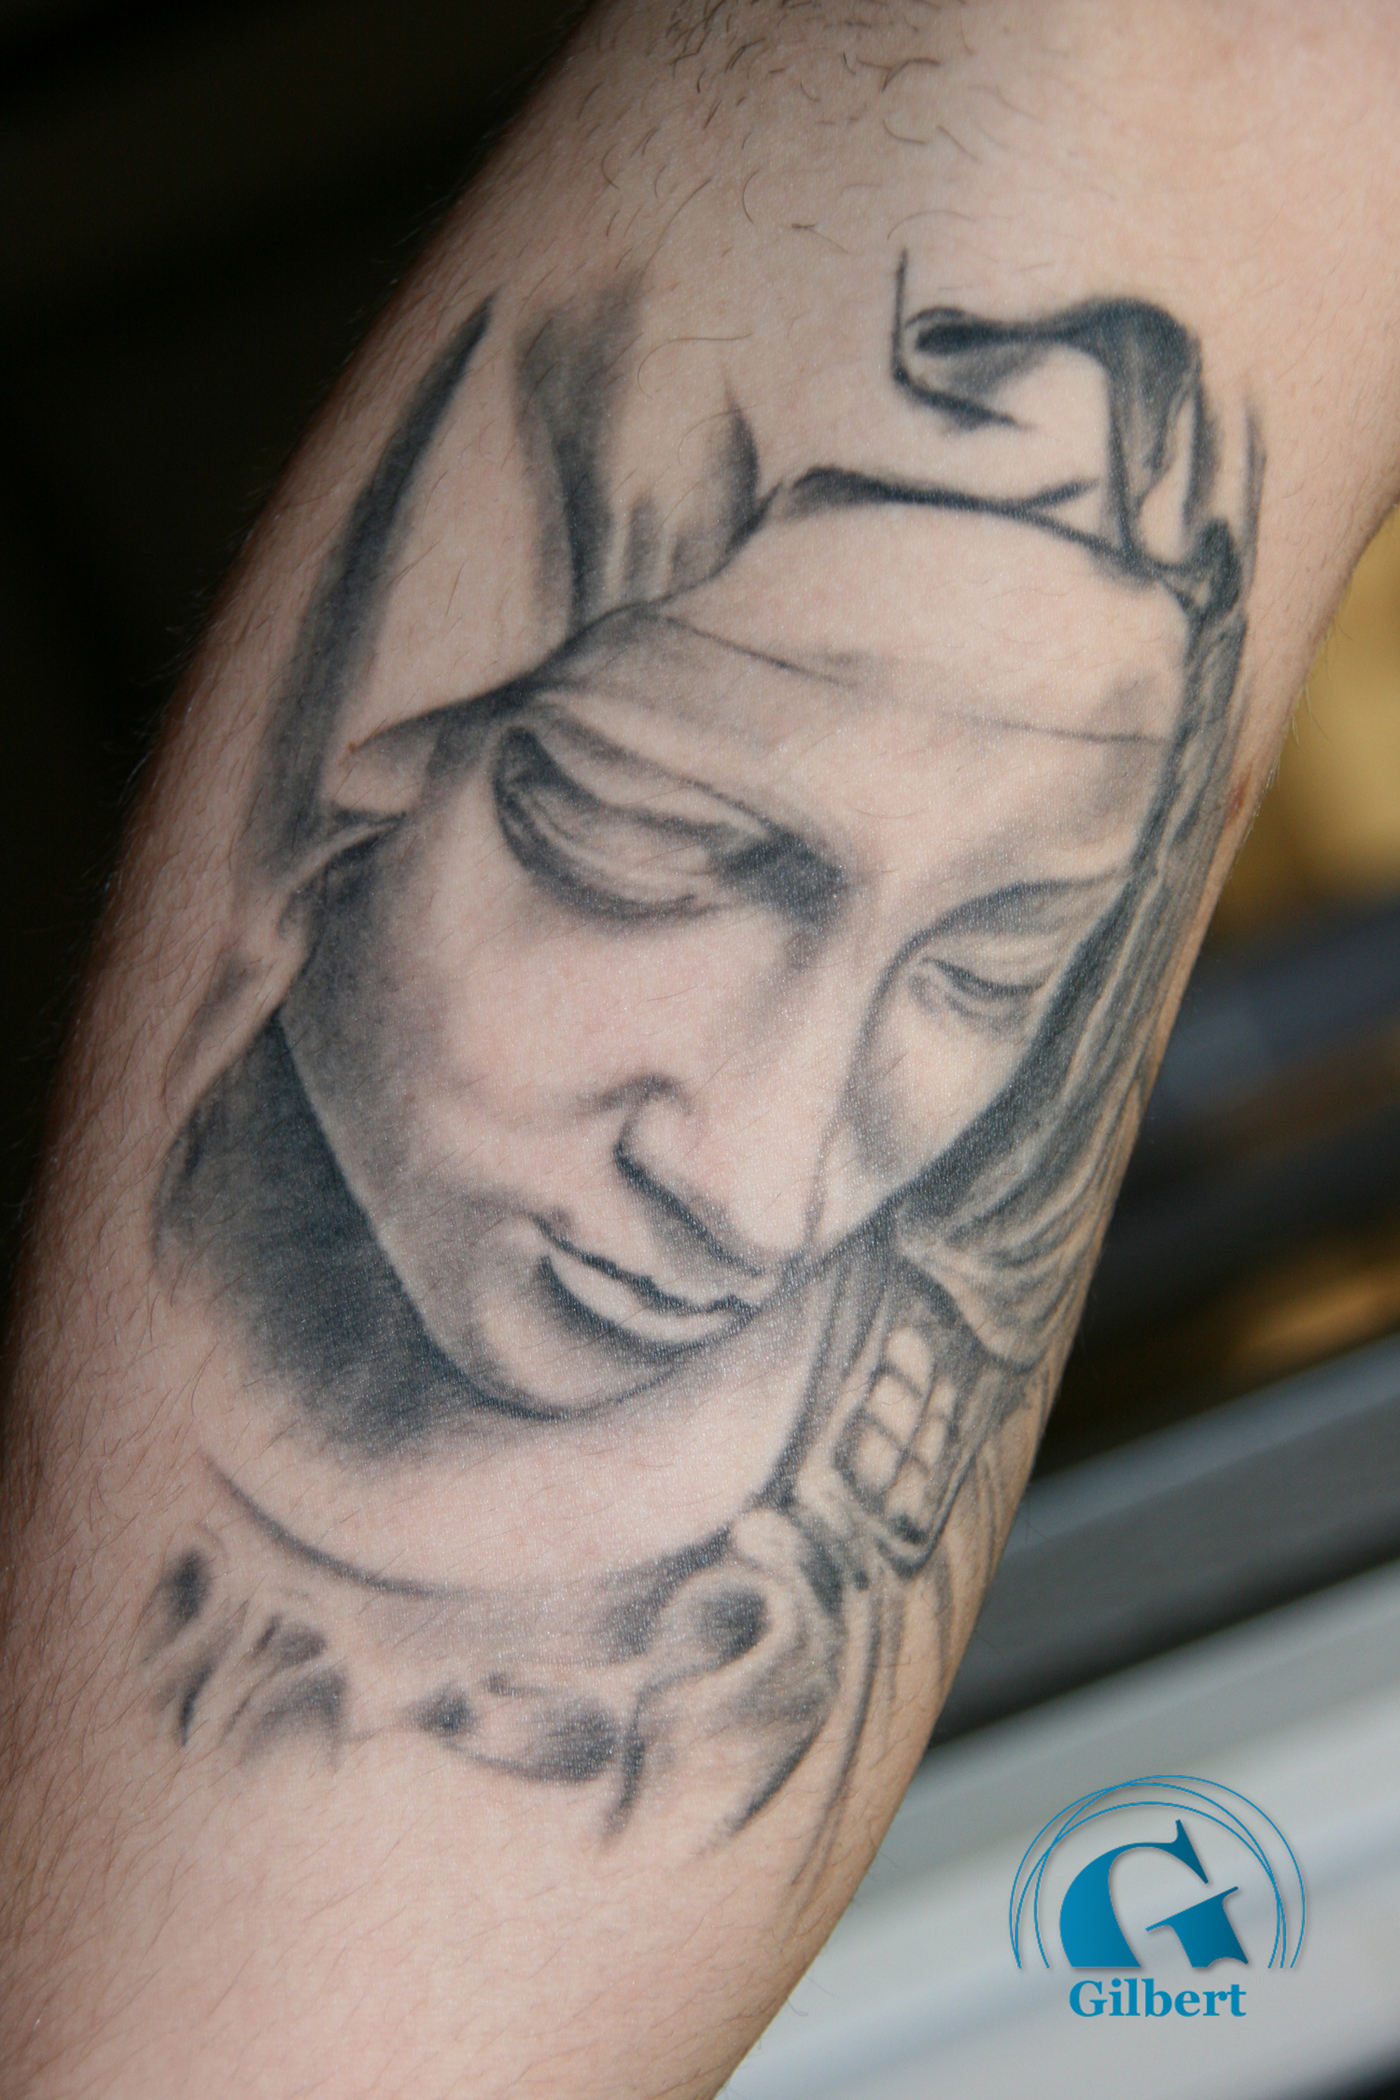 Tatouage bebe ange galerie tatouage - Tatouage cerf signification ...